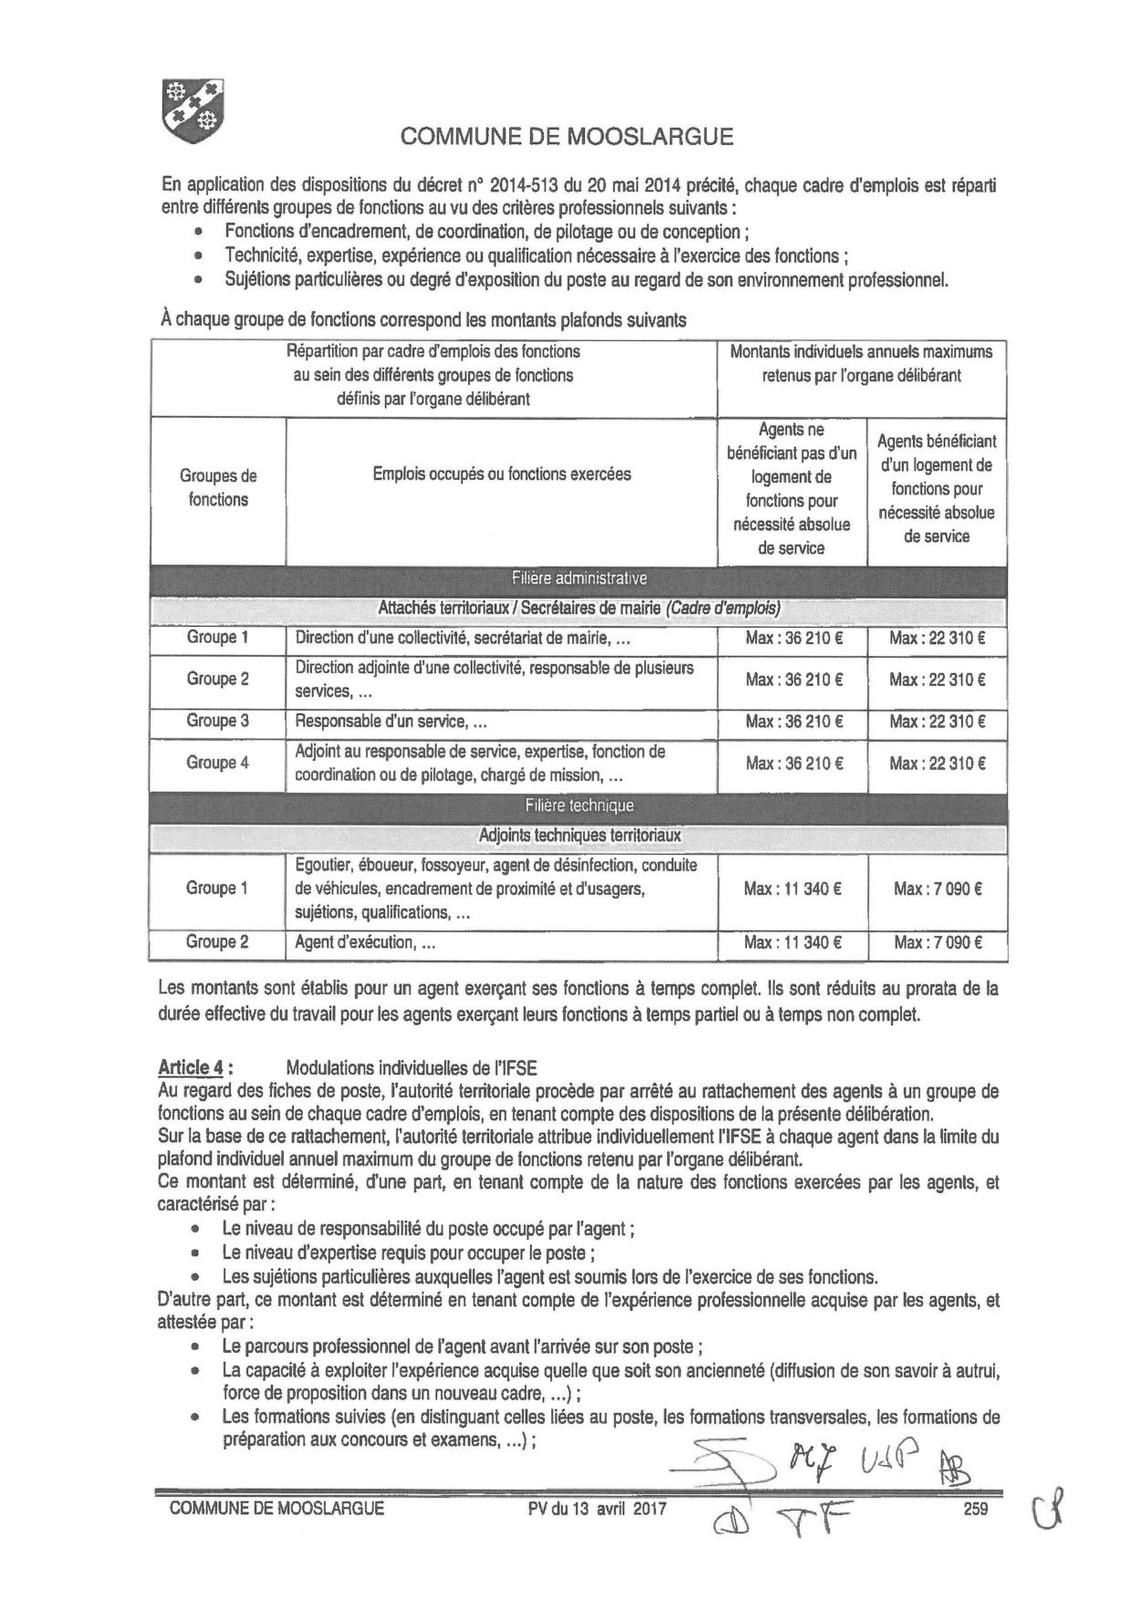 Conseil Municipal du 13 avril 2017